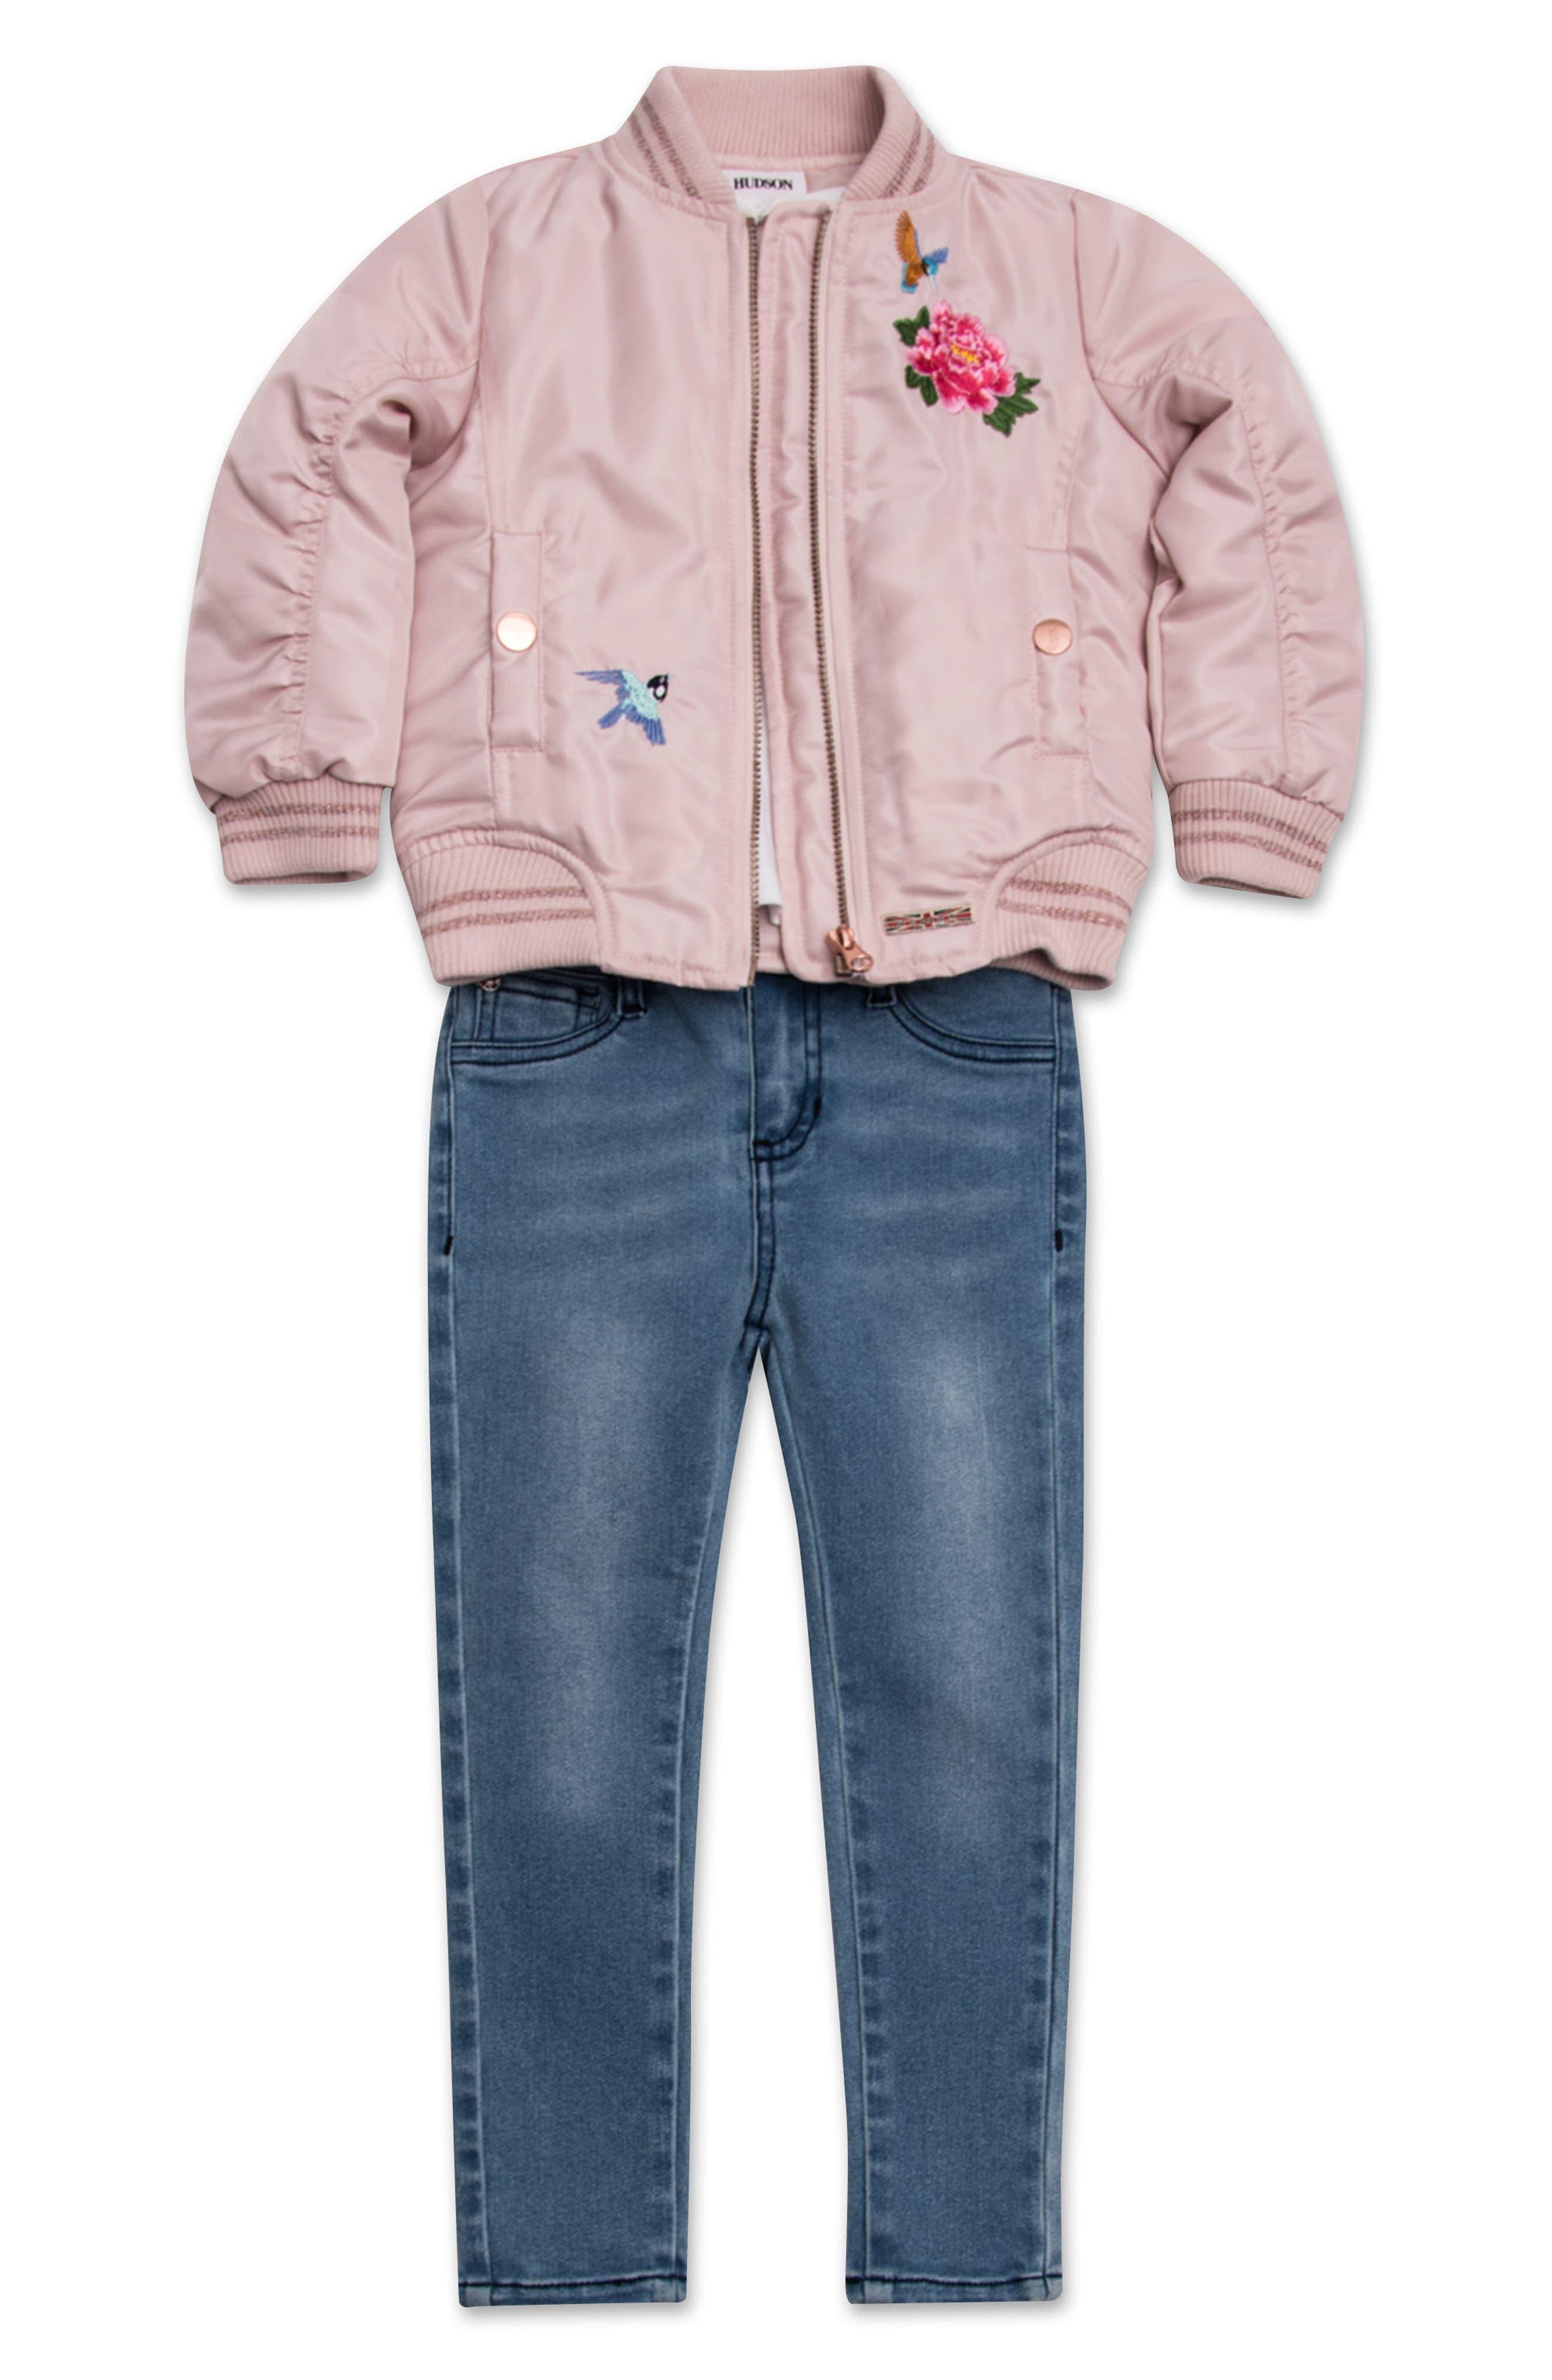 Hudson Kids Embroidered Bomber Jacket, Tee & Jeggings Set (Baby Girls)